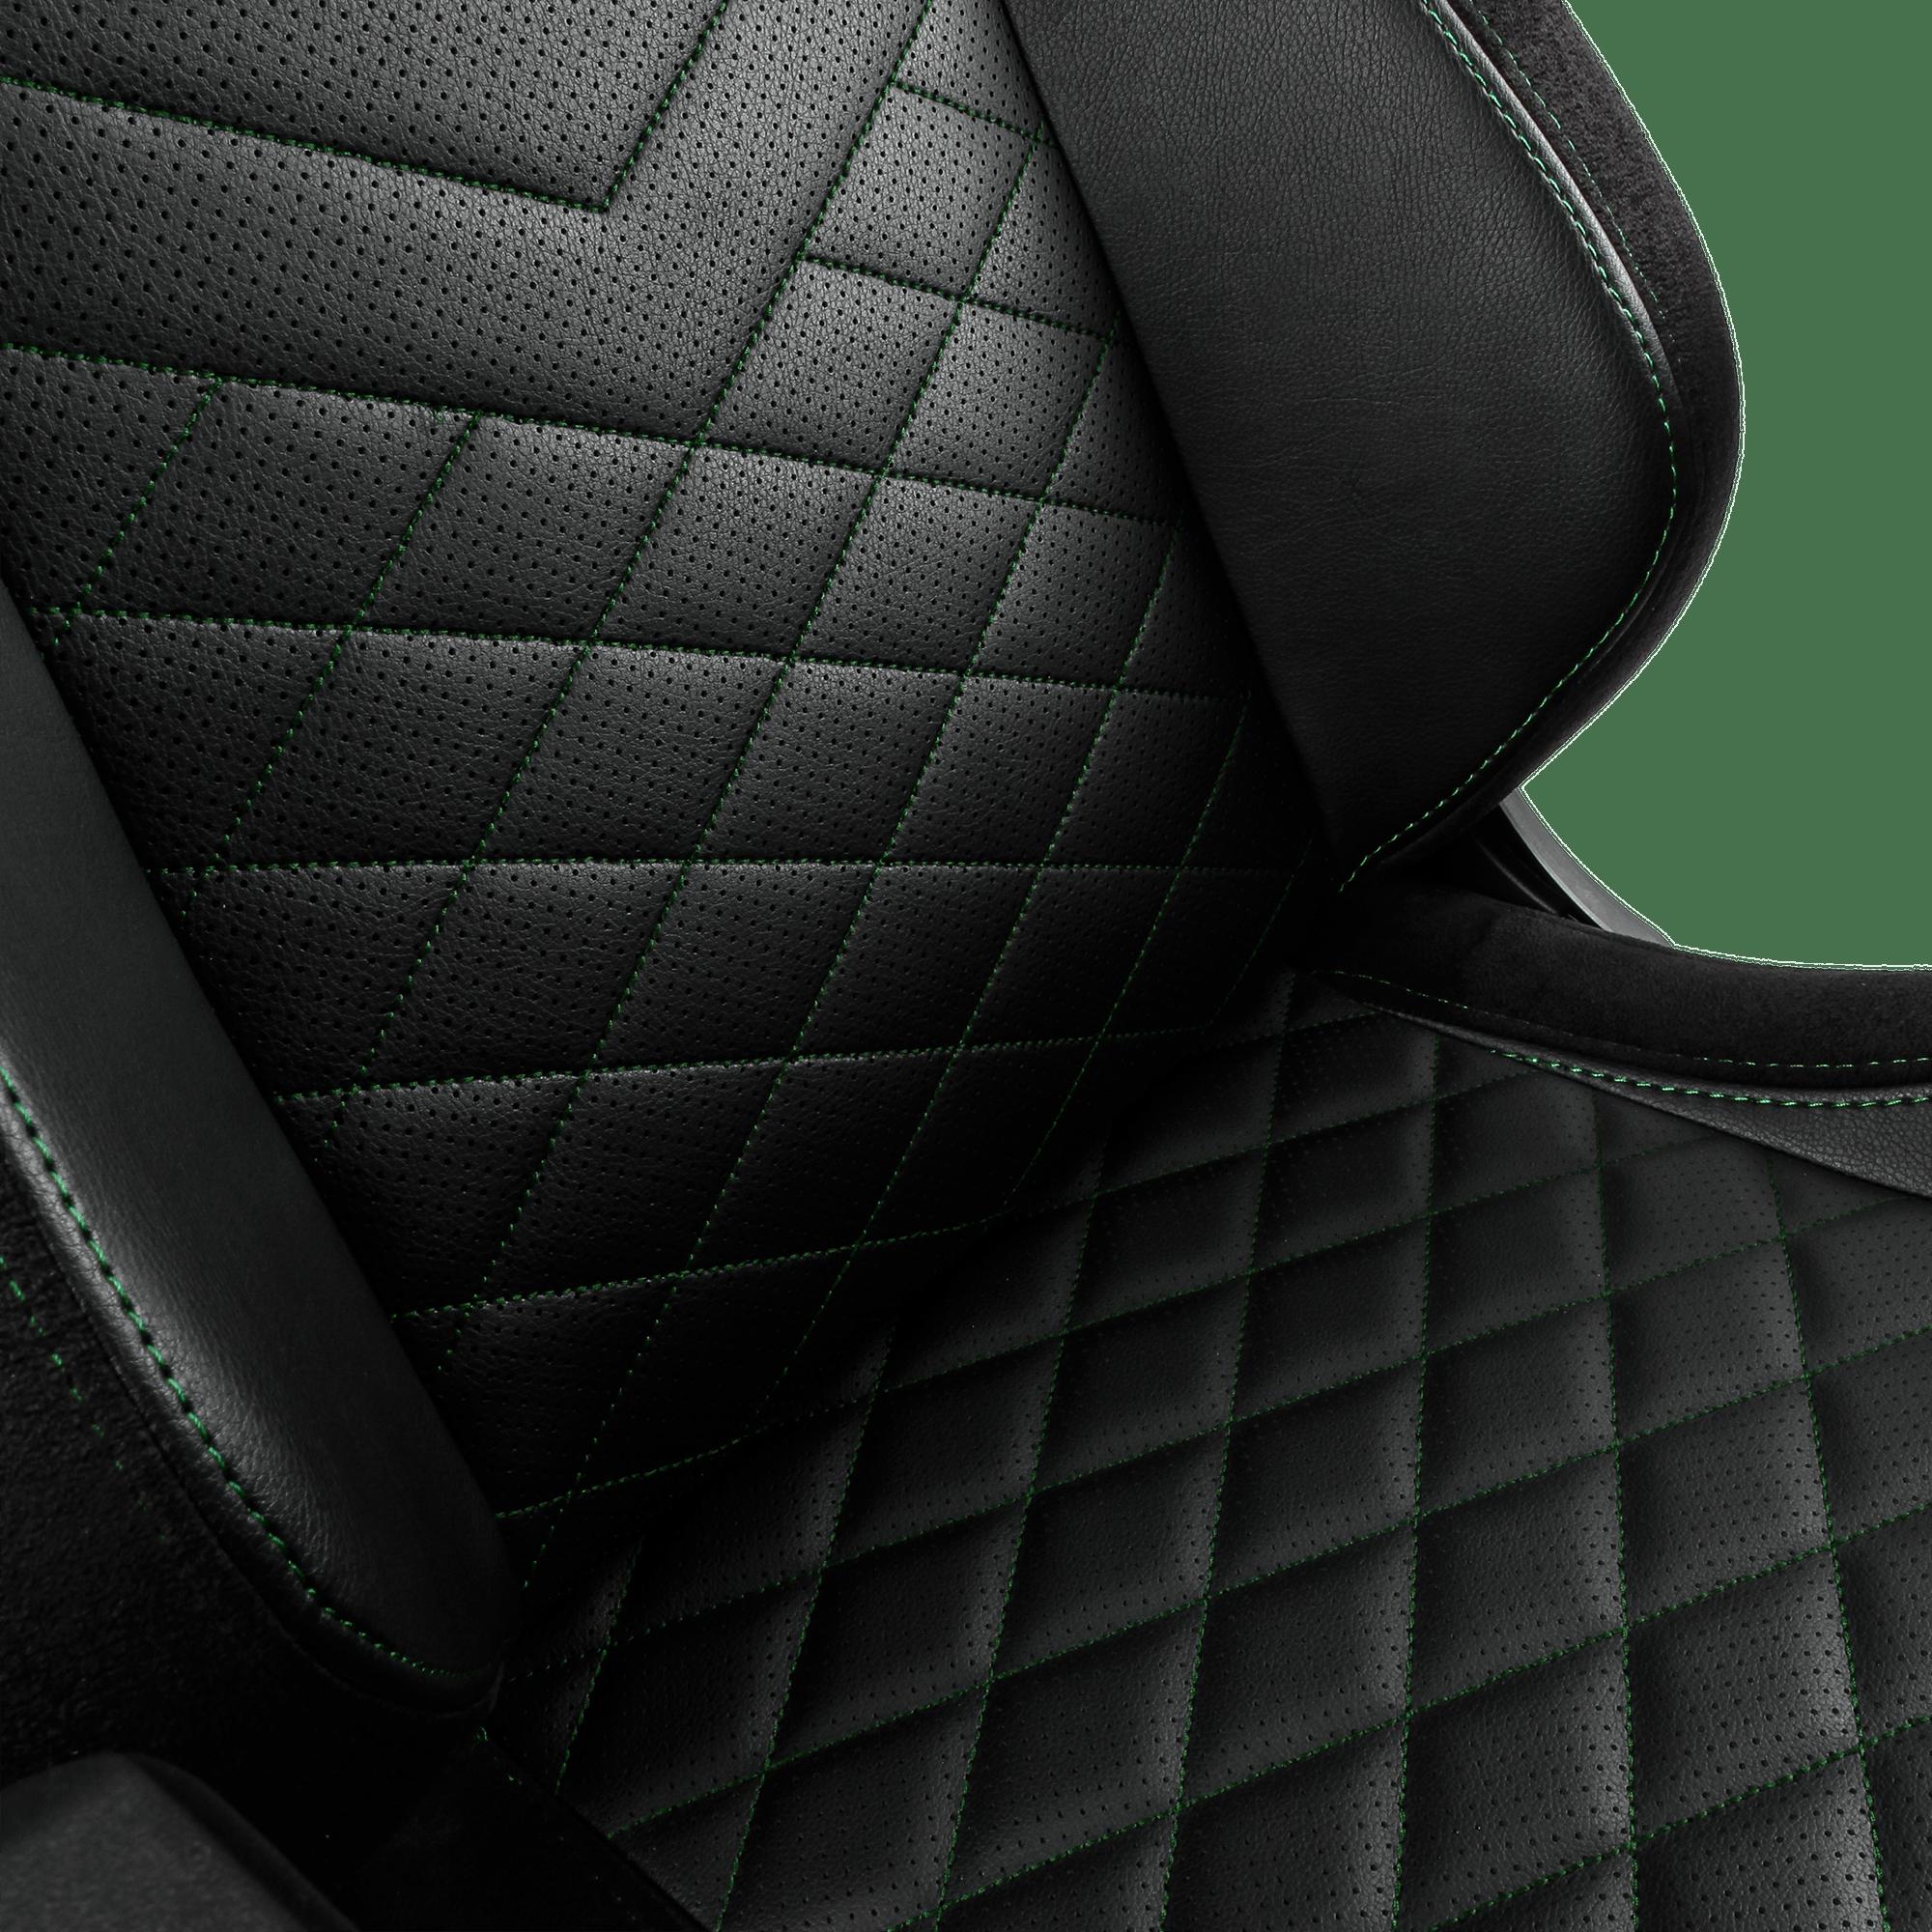 Noblechairs - EPIC Noir / Vert